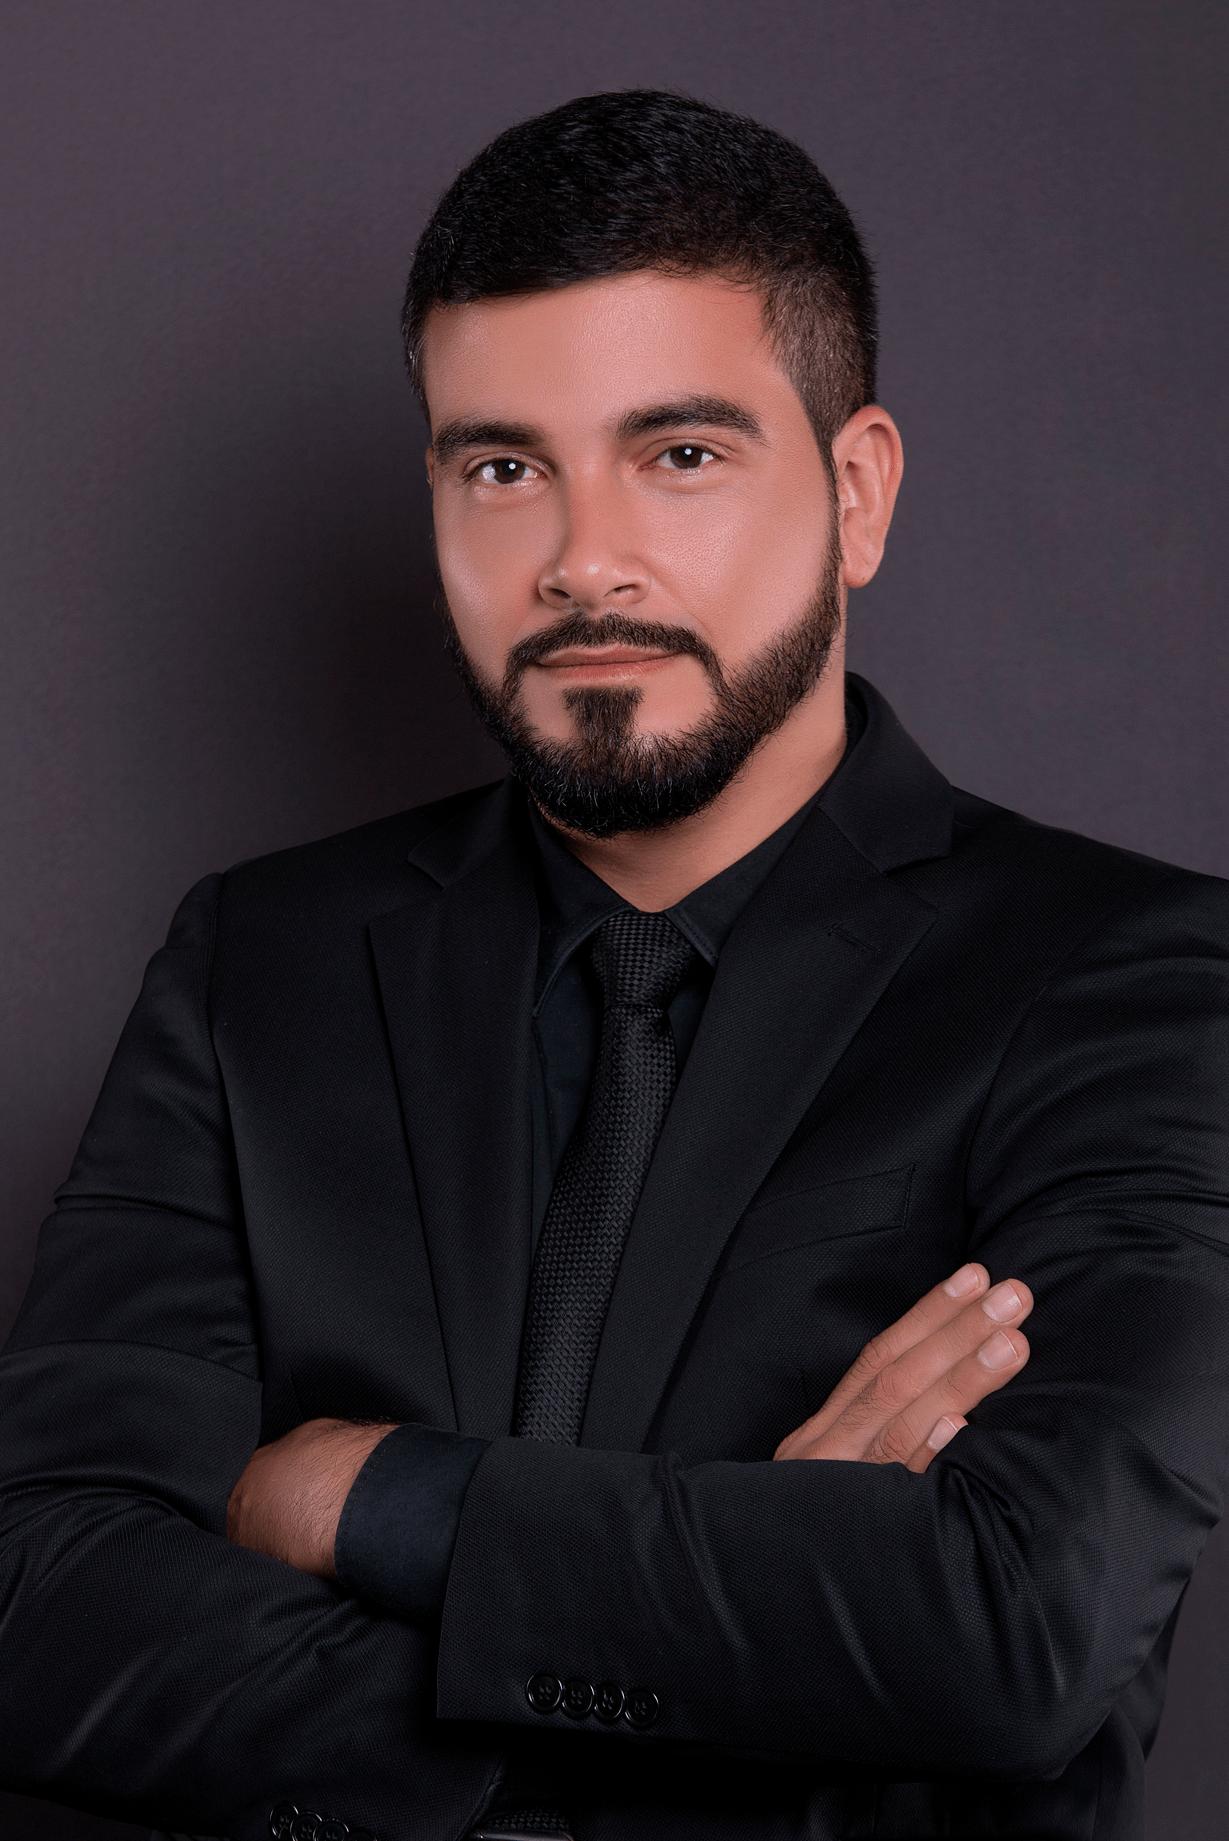 Christian Alba